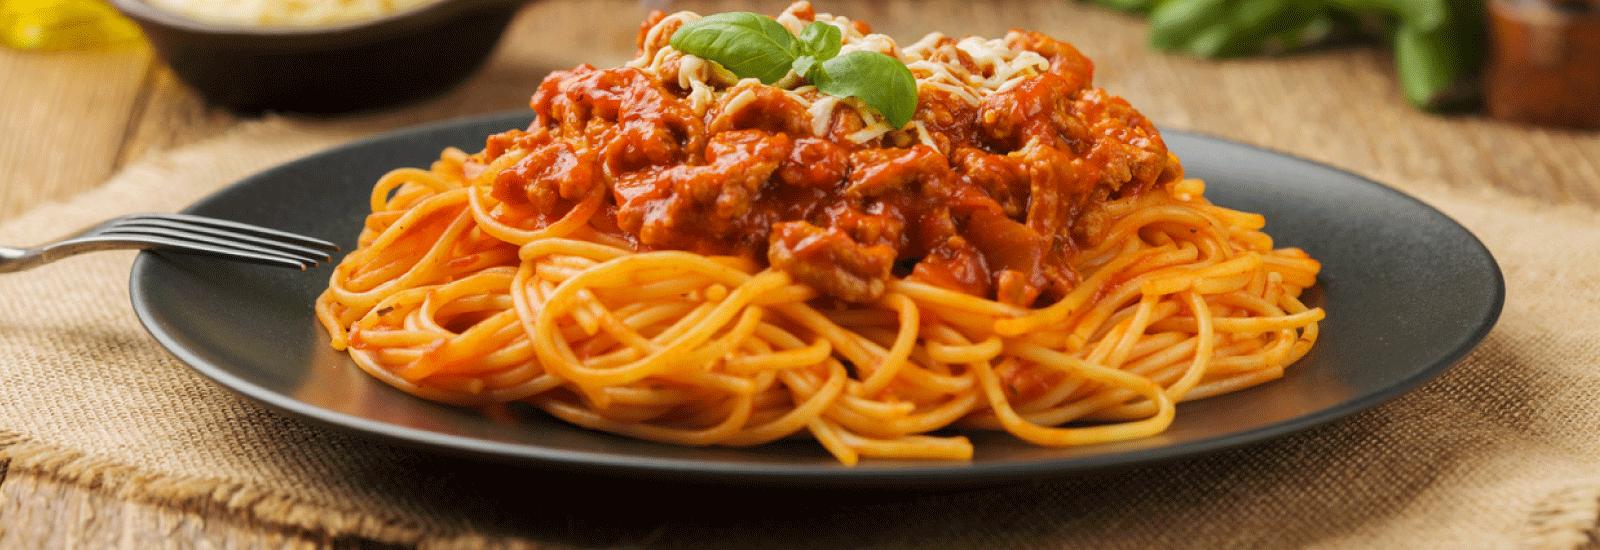 Italian Cuisine Near Dyess AFB